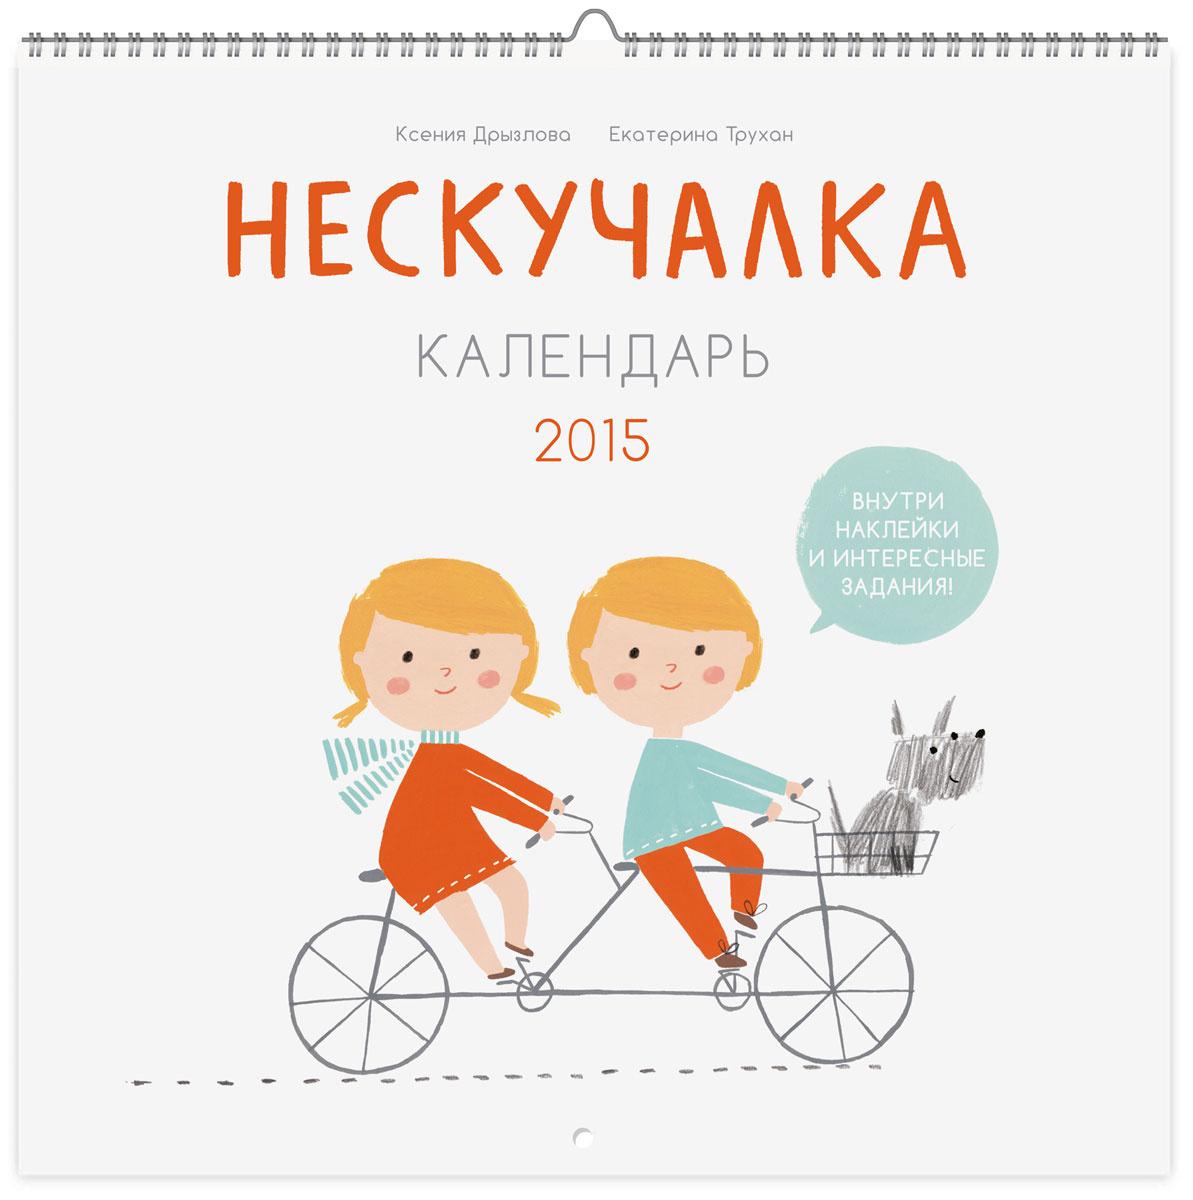 Календарь 2015 (на спирали). Нескучалка #1